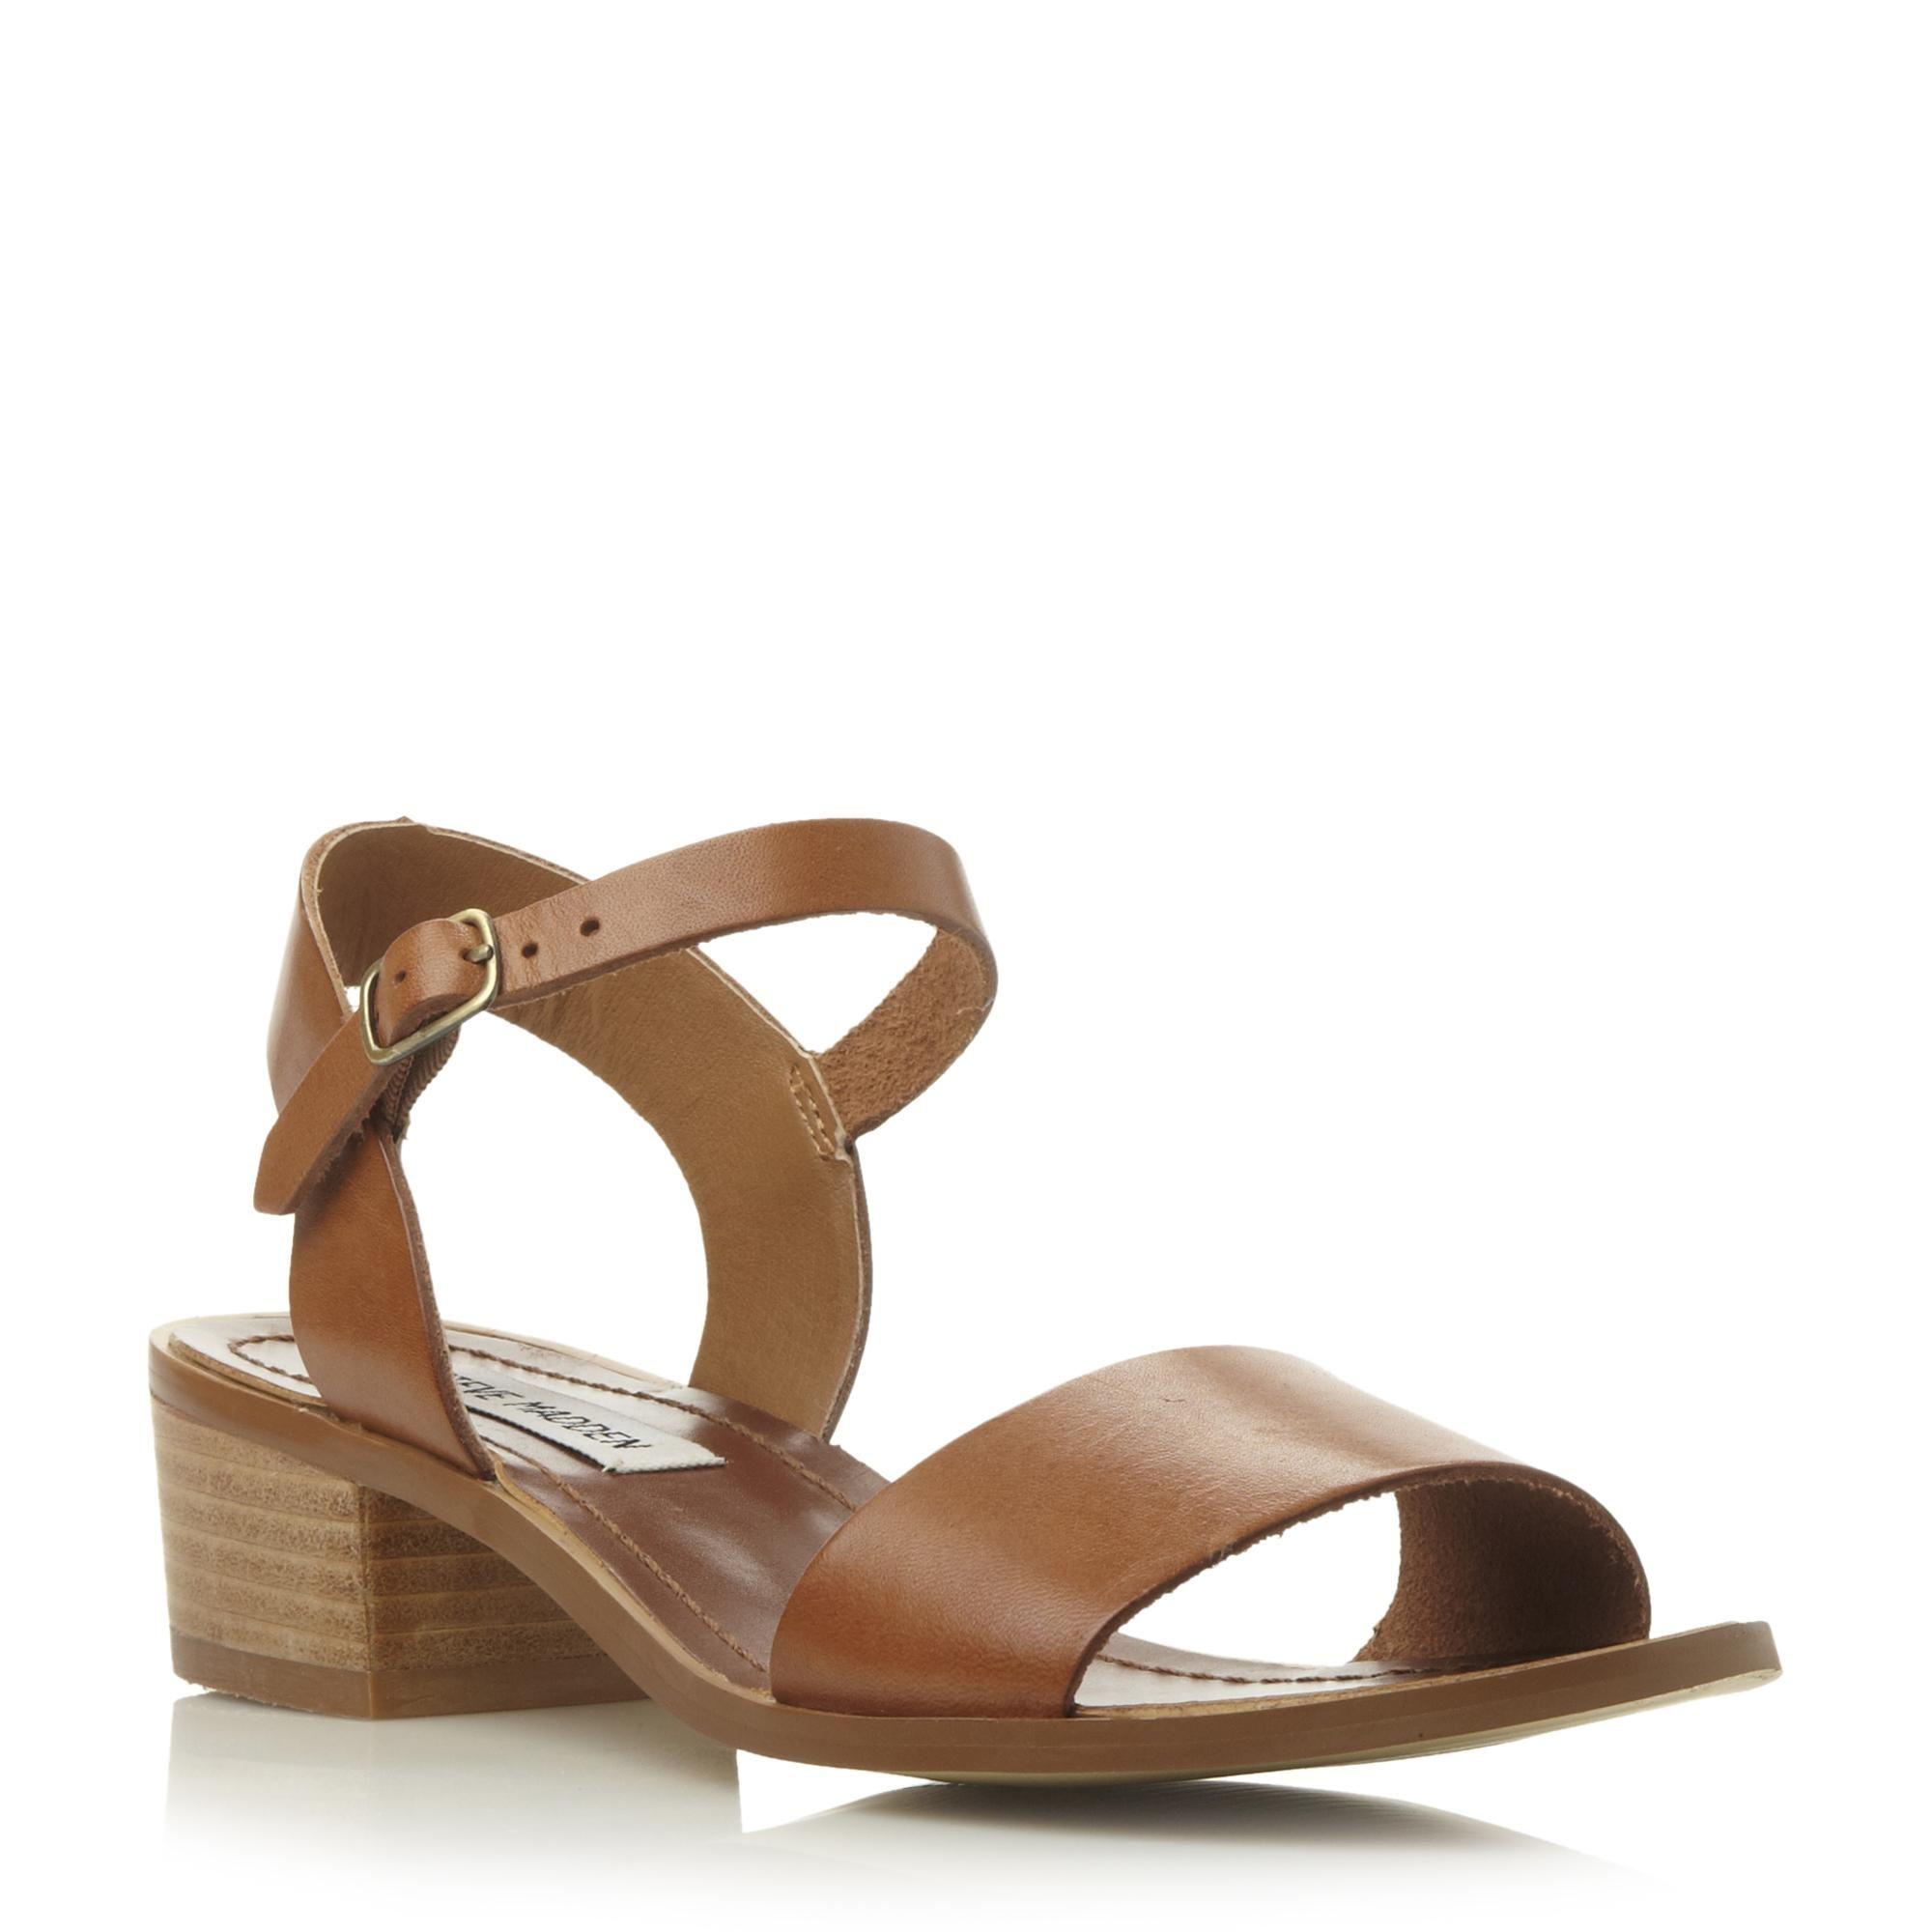 d68482b901b STEVE MADDEN DENSE SM - Low Block Heel Sandal - tan